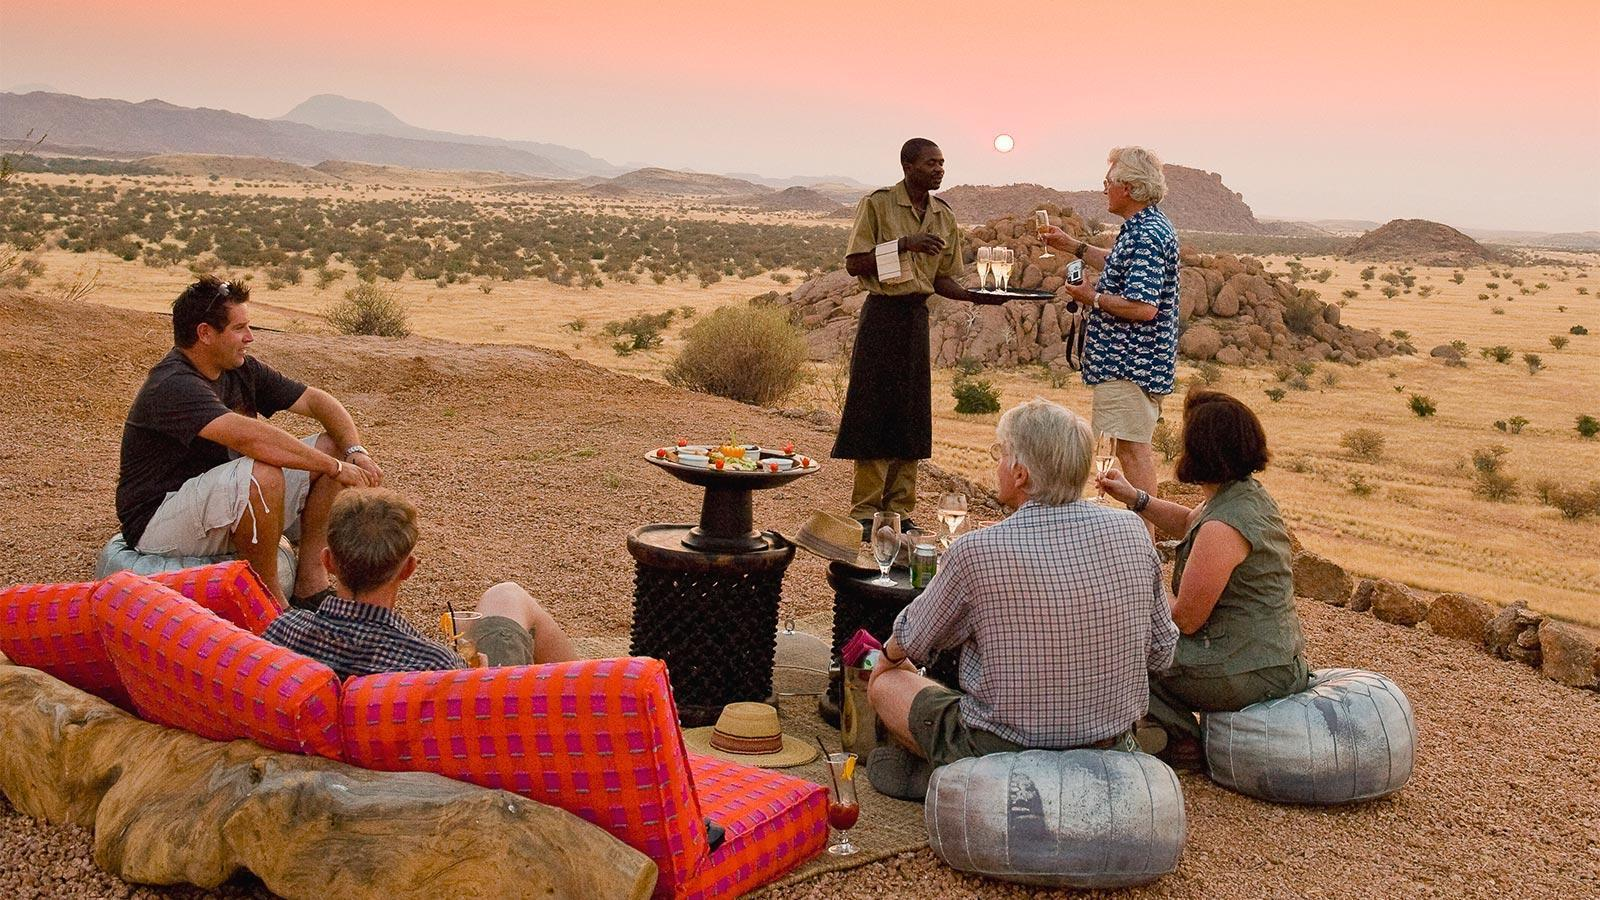 Summer Camp Spotlight: Imparting Social, Musical and